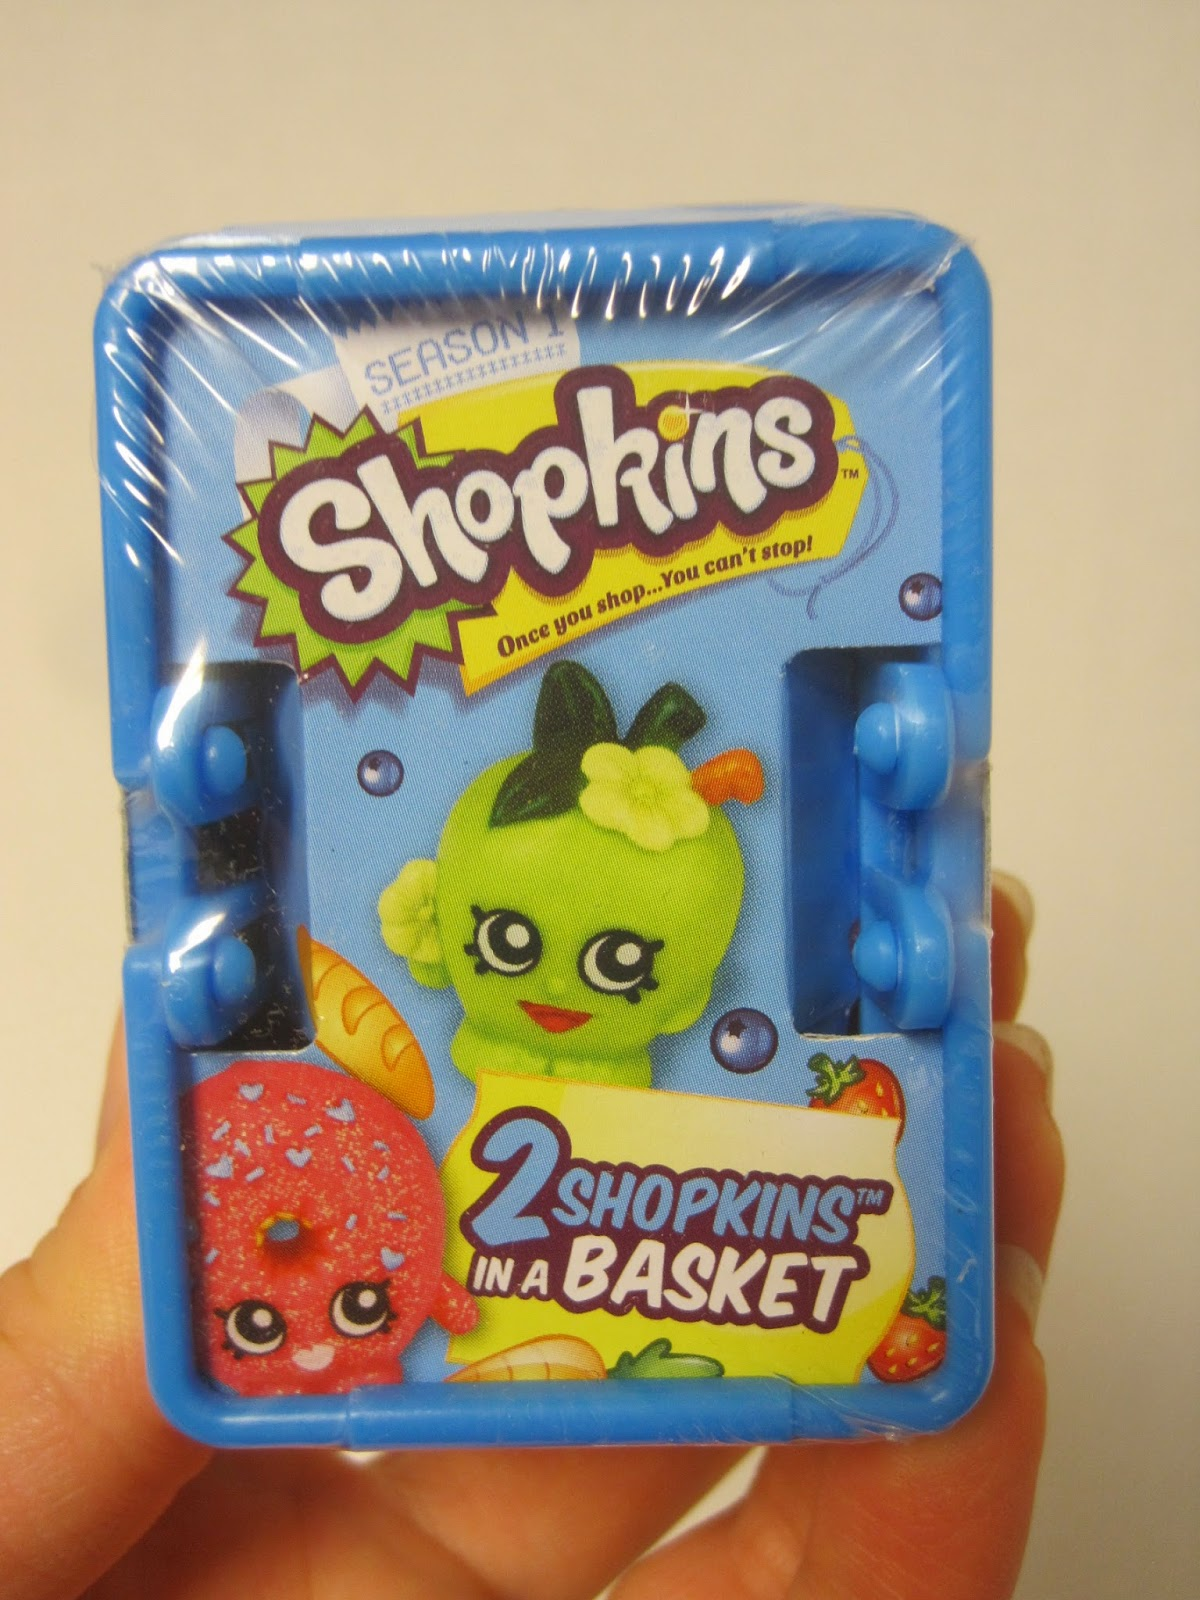 Walmart shopkins toys for sale myideasbedroom com